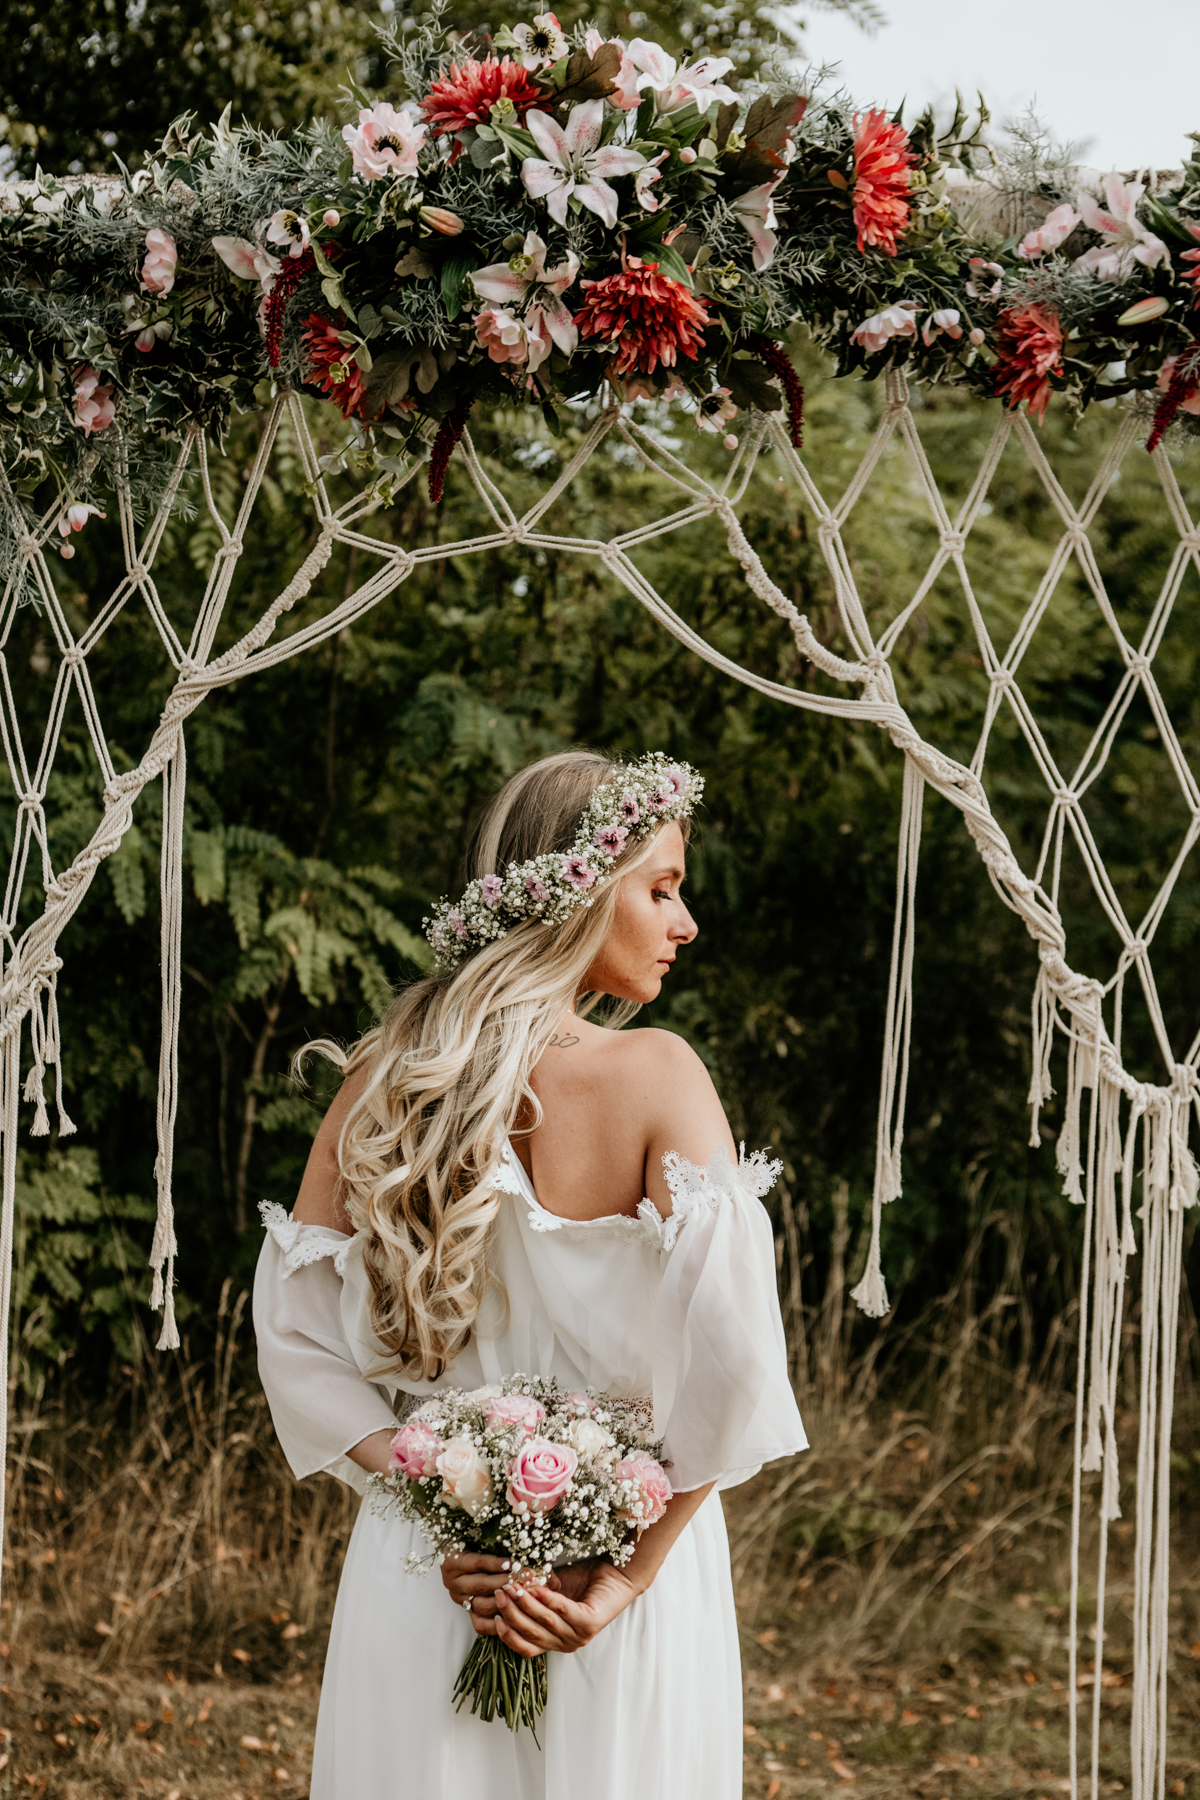 Styled Wedding 1 beeld.schoon-selinderella klein formaat-40